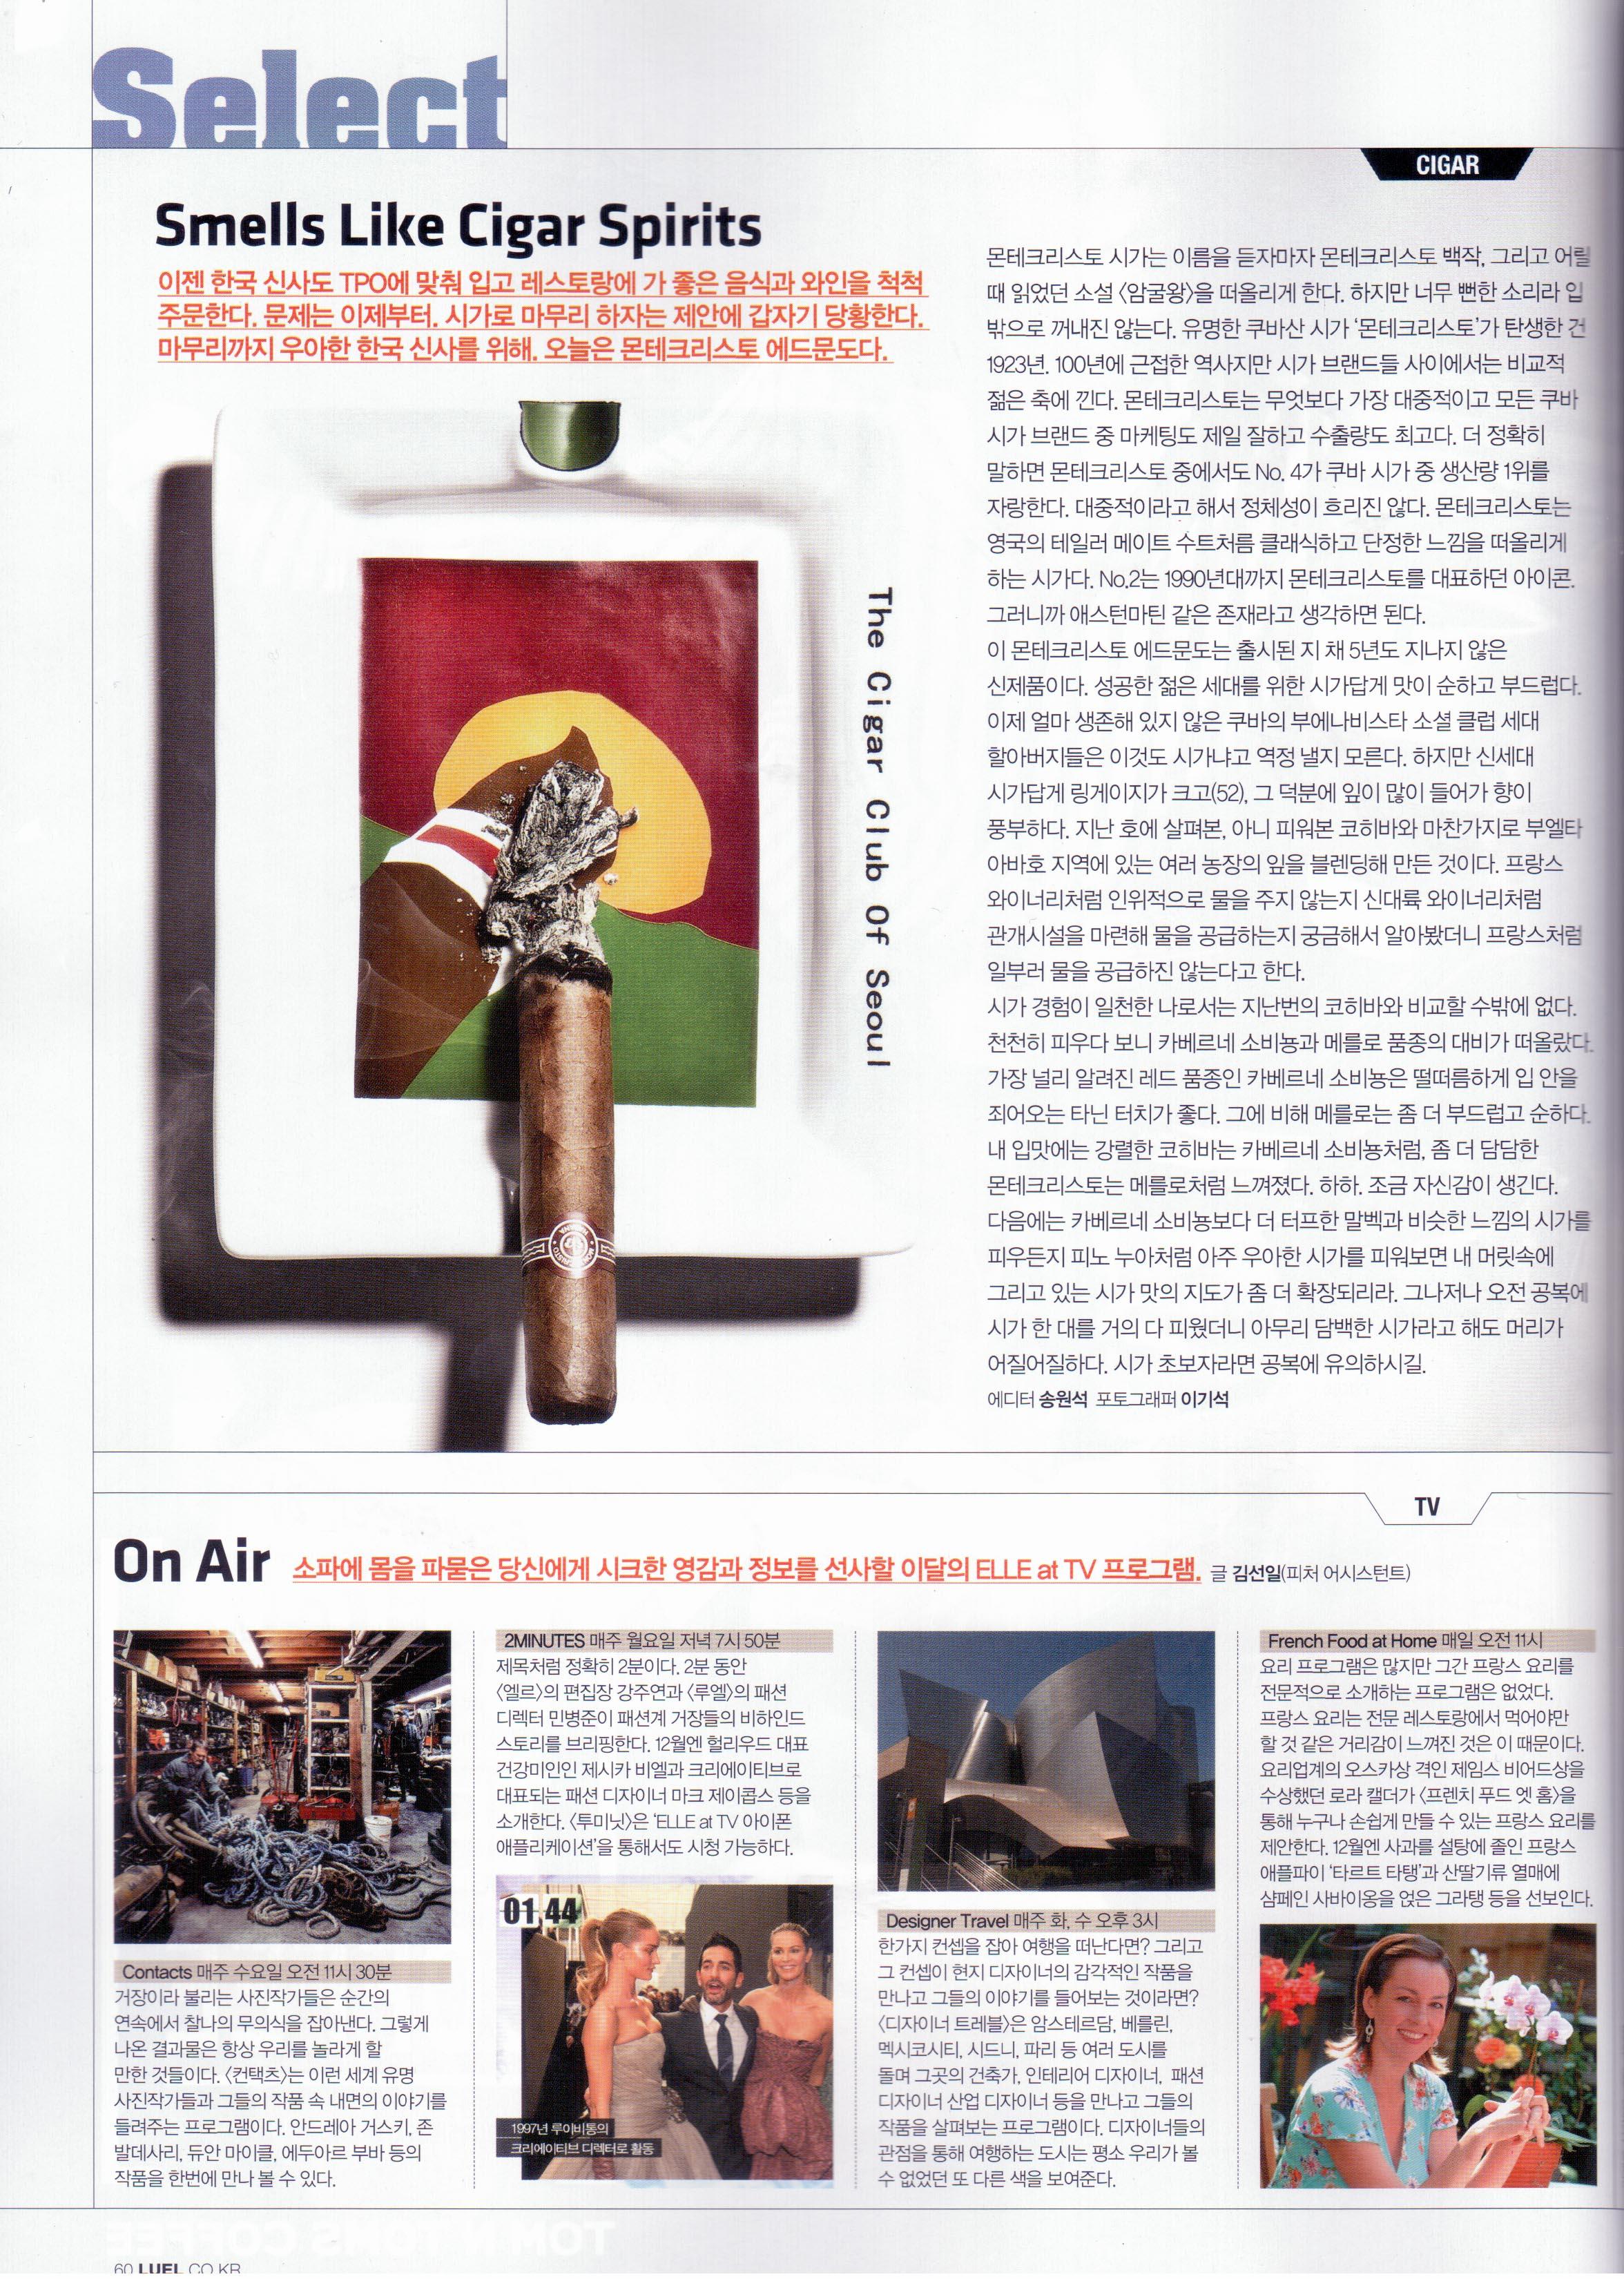 2010-12 Luel article.jpg